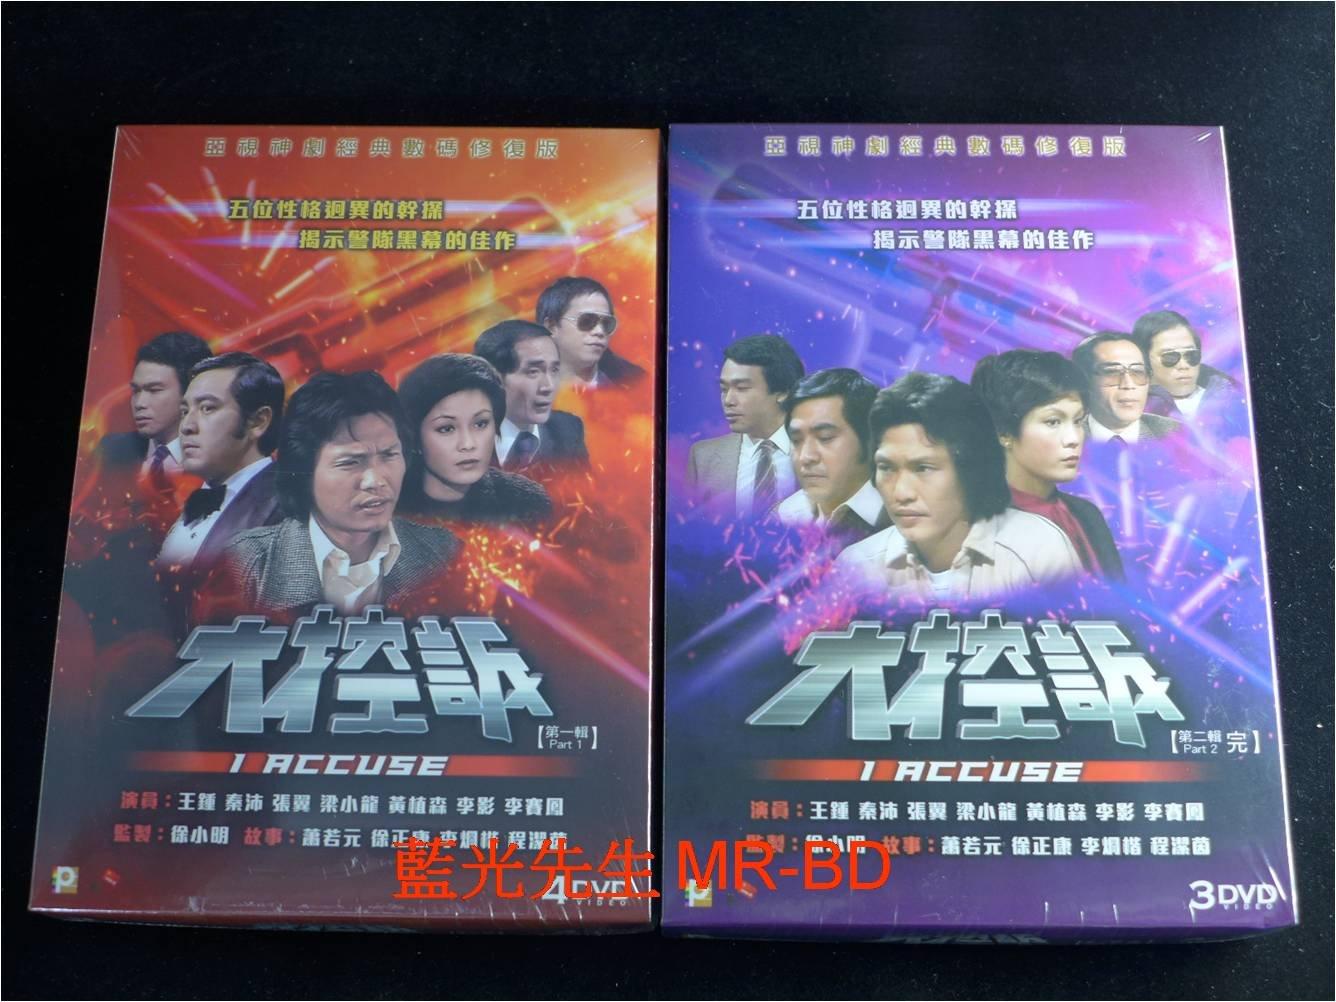 [DVD] - 大控訴 I Accuse 1-25集 七碟數碼修復版